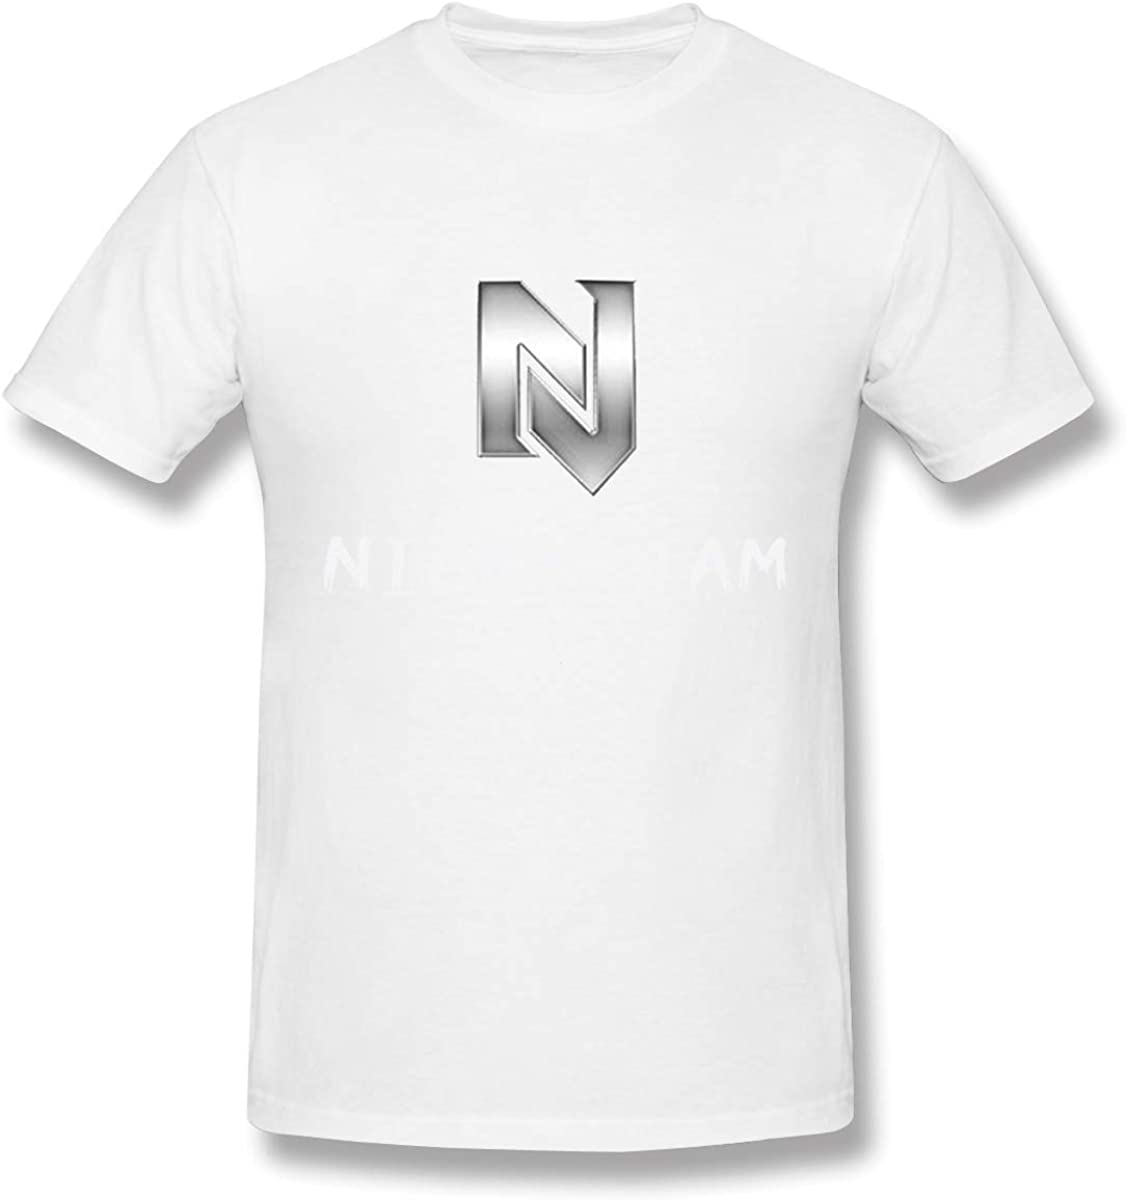 Camisetas Blancas de algodón Nicky Jam Design para Hombre: Amazon ...